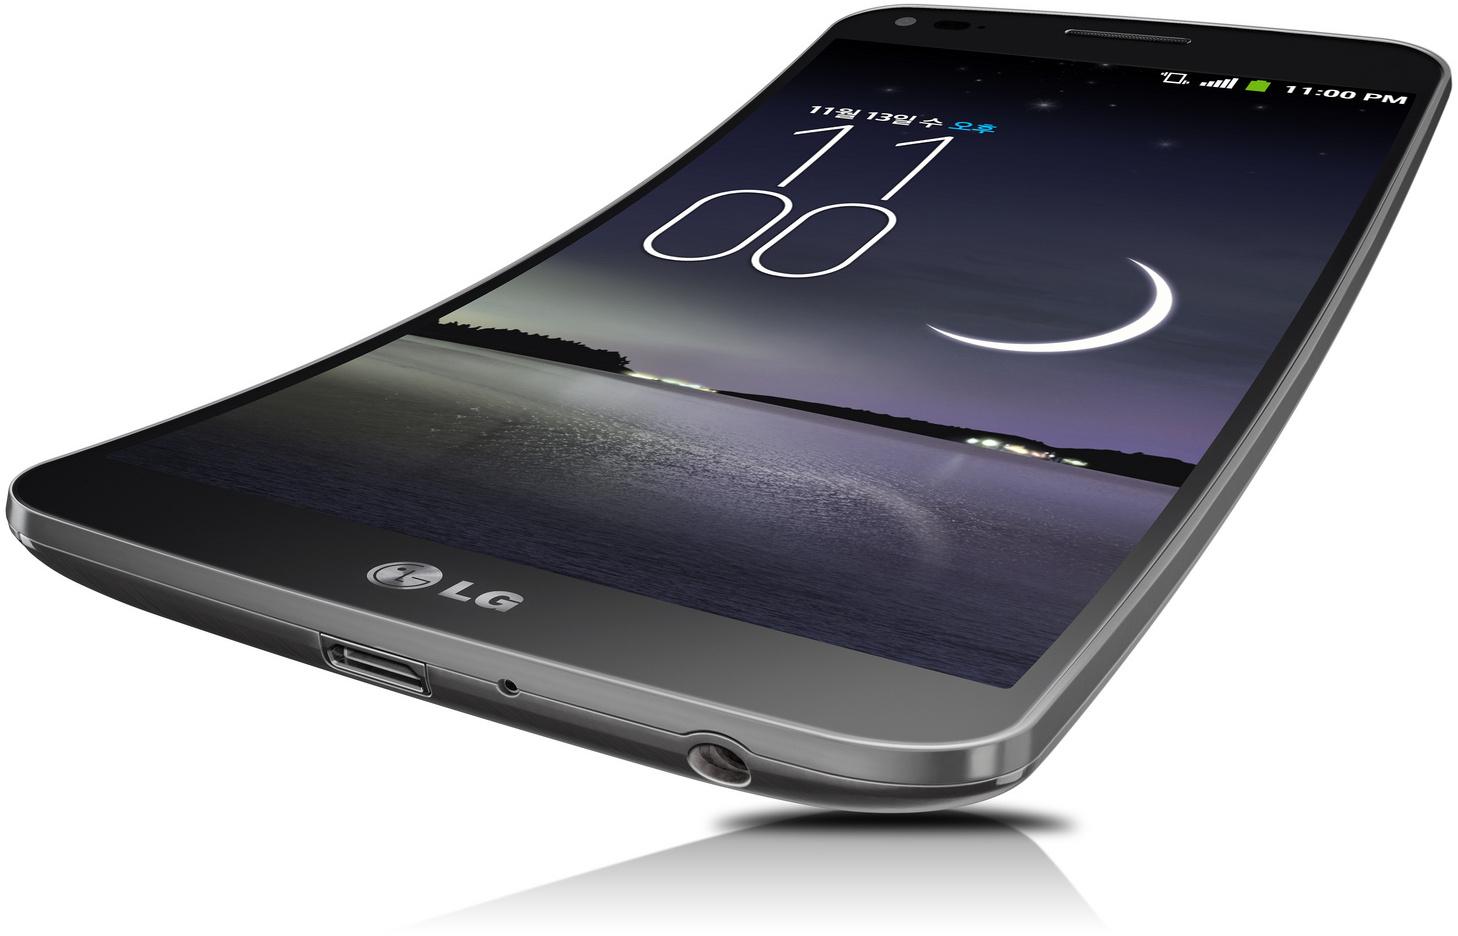 Quale smartphone comprare a 200 euro